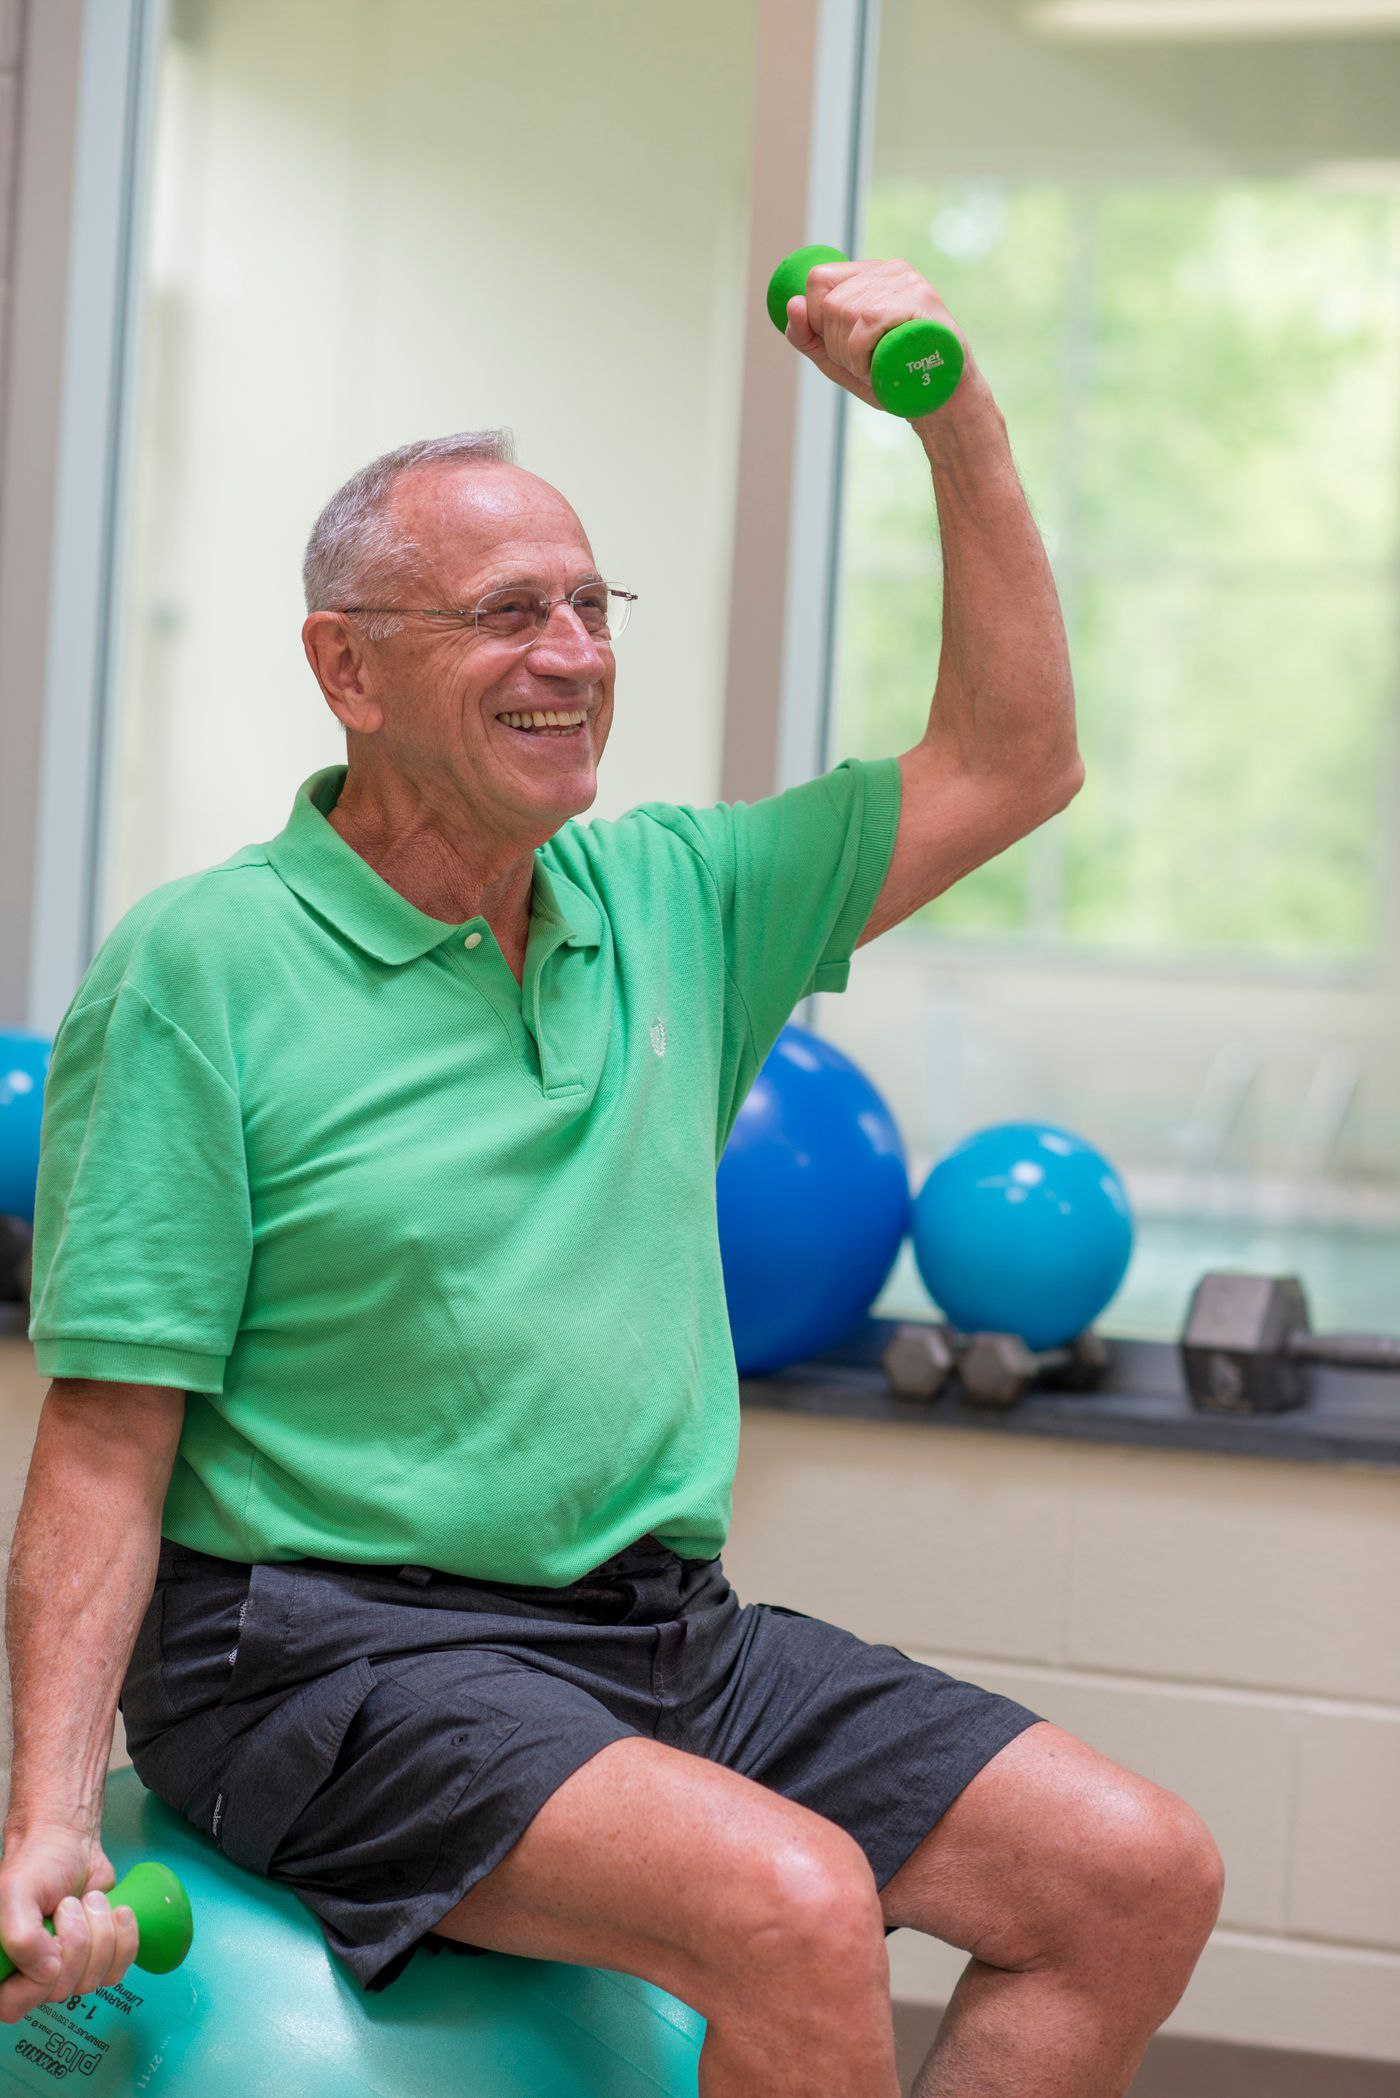 Lifelong Fitness | Lifting Weights